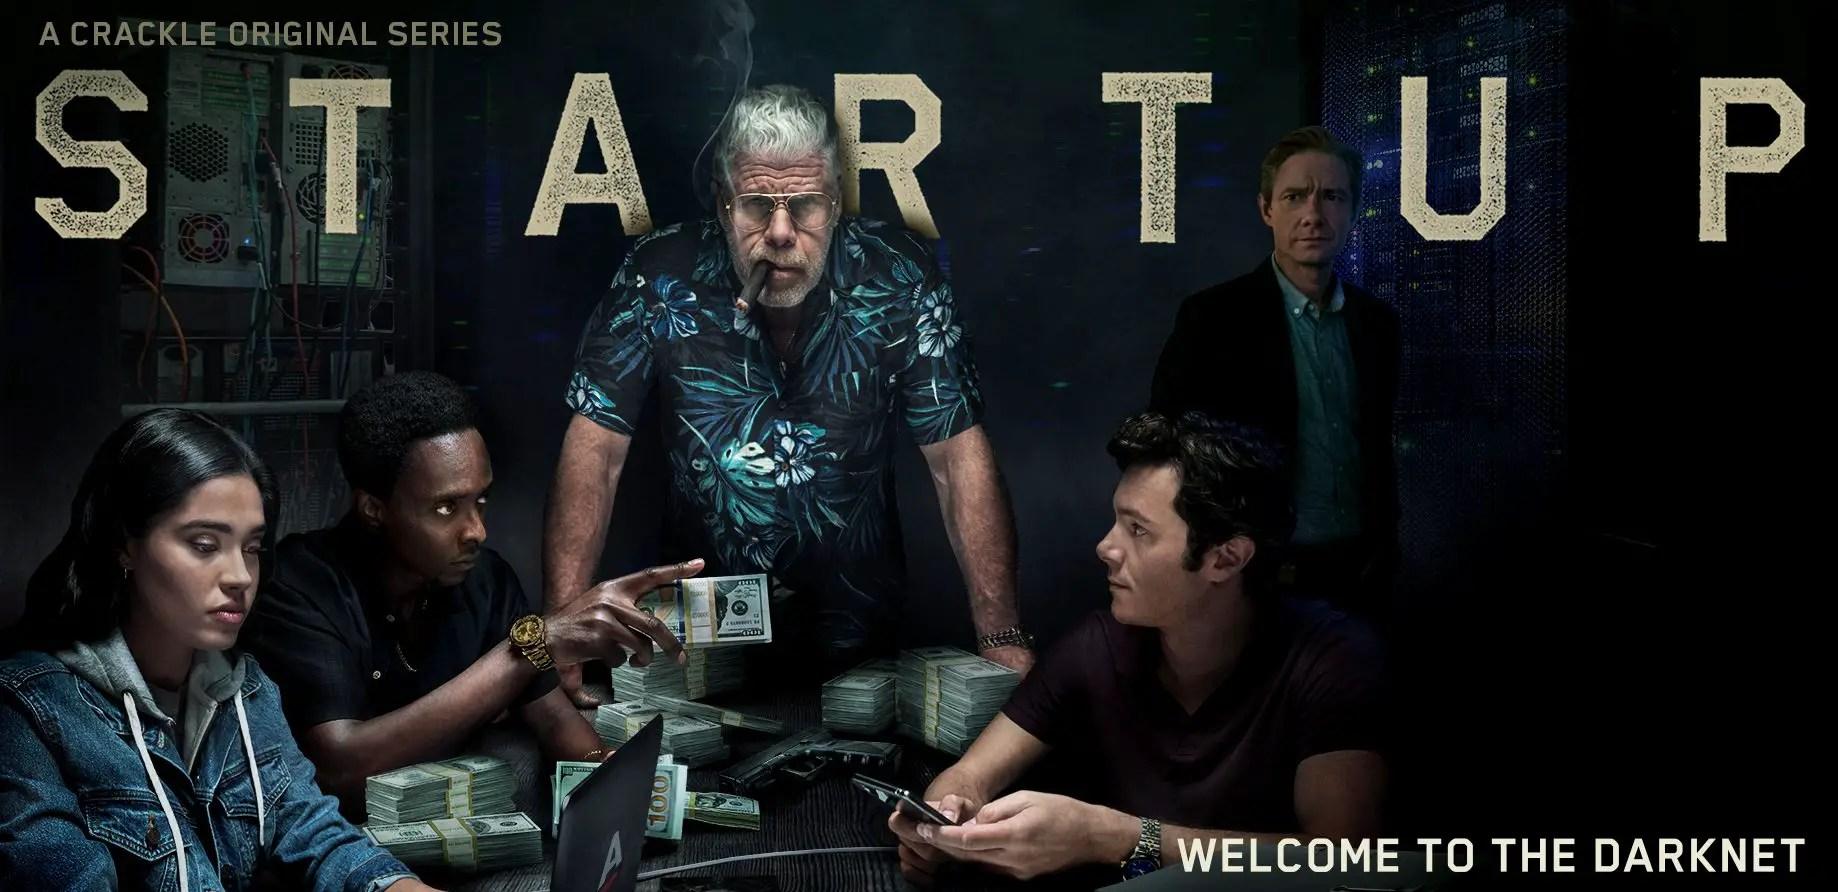 StartUp Season 3 Production Begins - Season 4 Next For Crackle TV